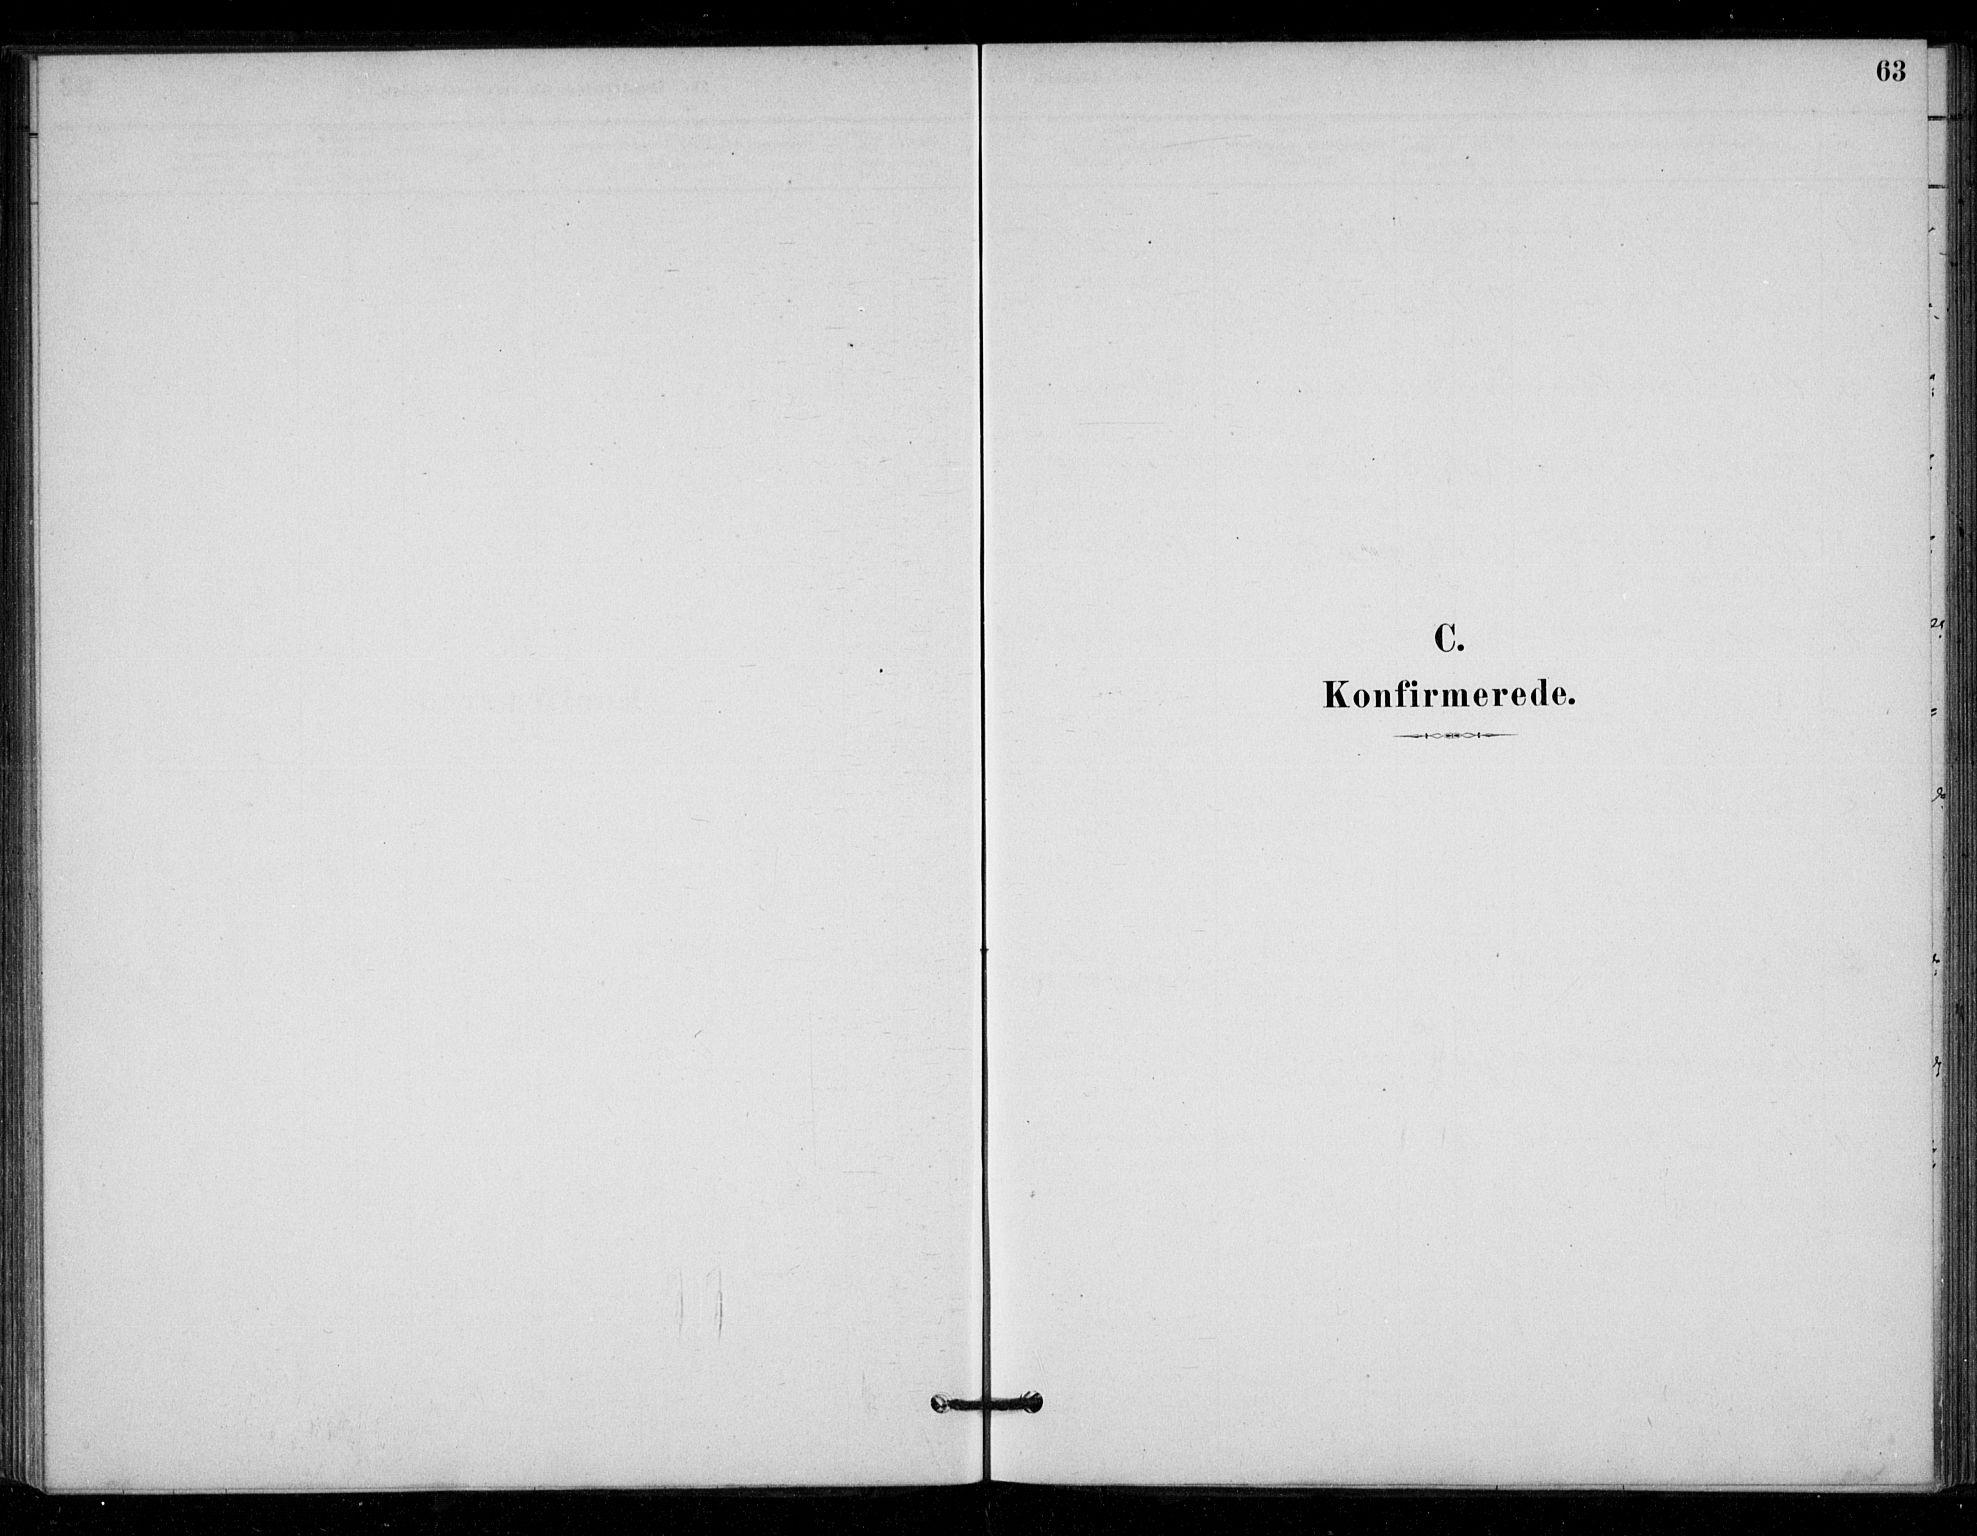 SAT, Ministerialprotokoller, klokkerbøker og fødselsregistre - Sør-Trøndelag, 670/L0836: Parish register (official) no. 670A01, 1879-1904, p. 63